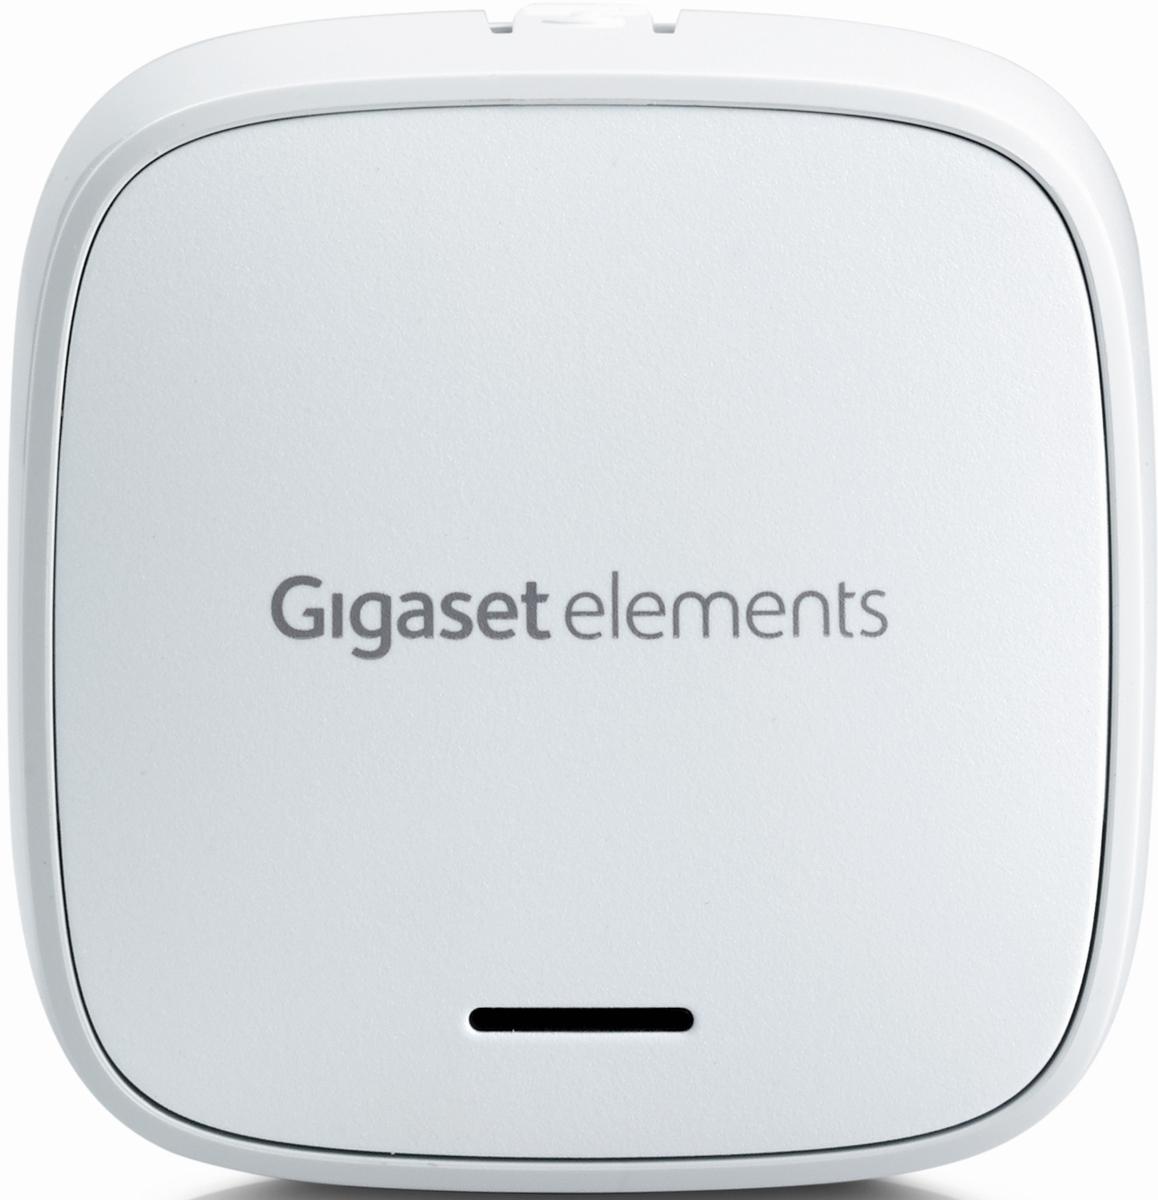 diverse Gigaset Elements SmartHome Produkte